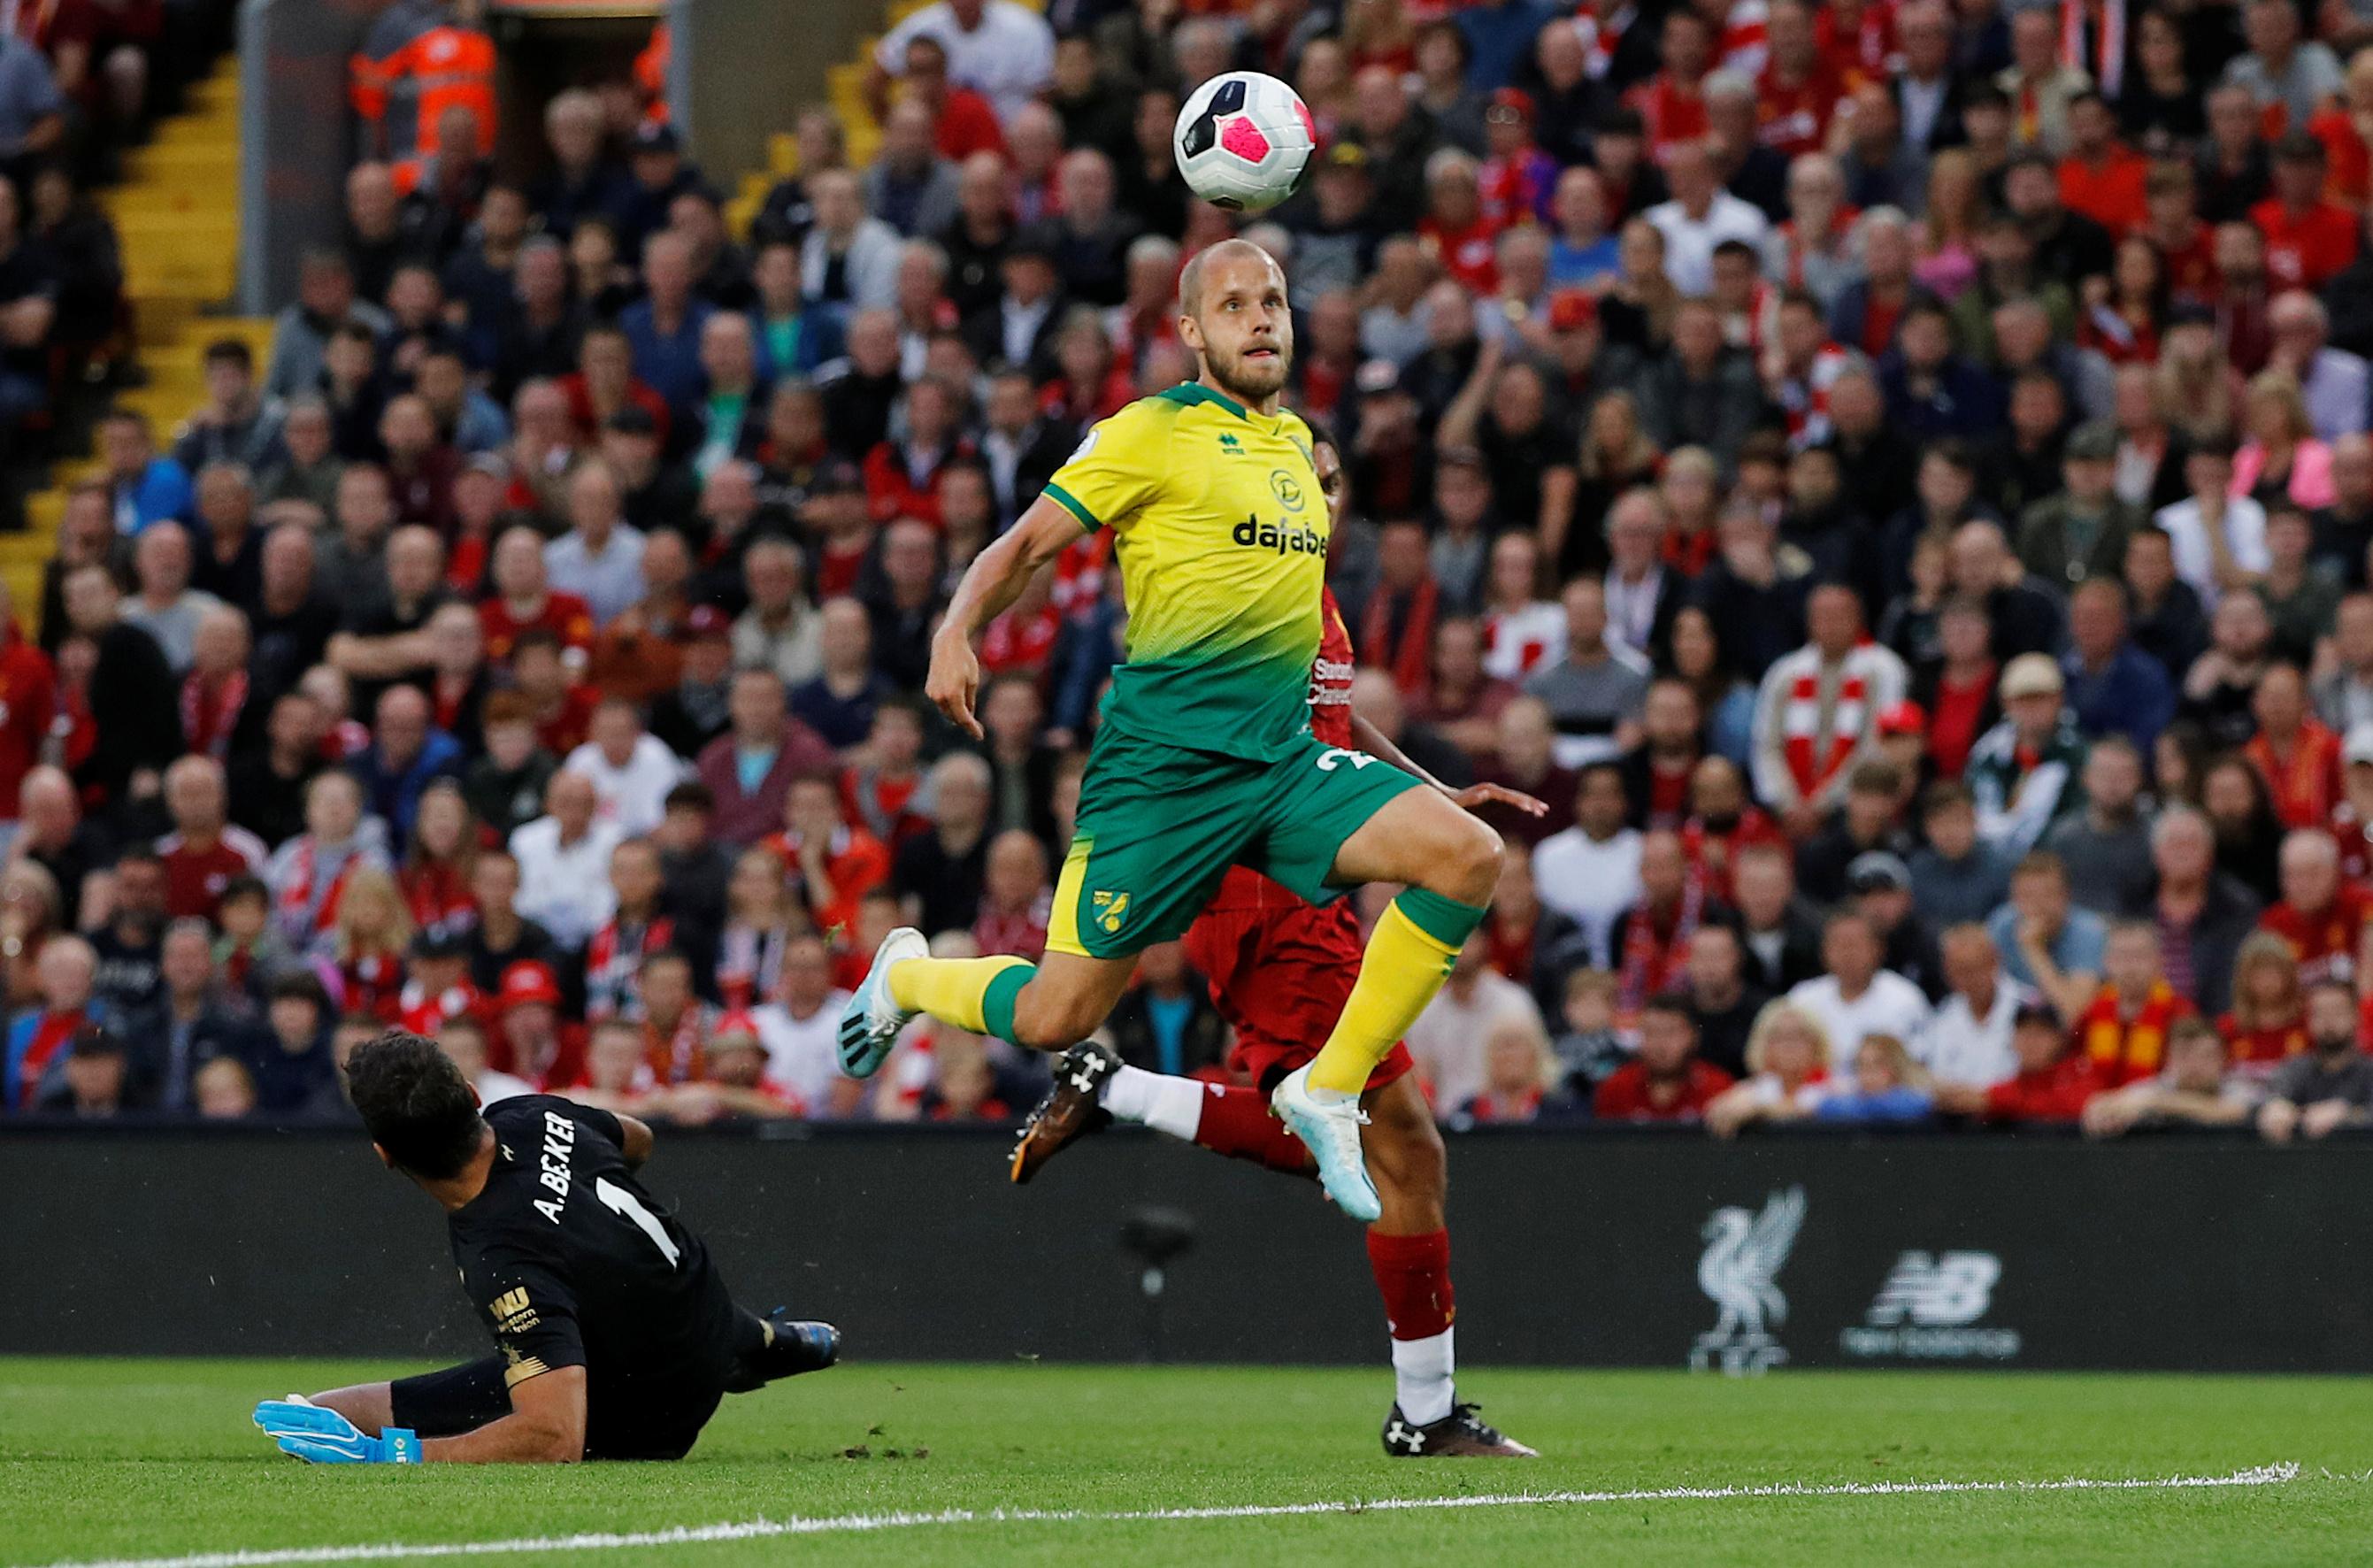 Football - Etranger - Norwich - Manchester City : Pukki en pleine lumière